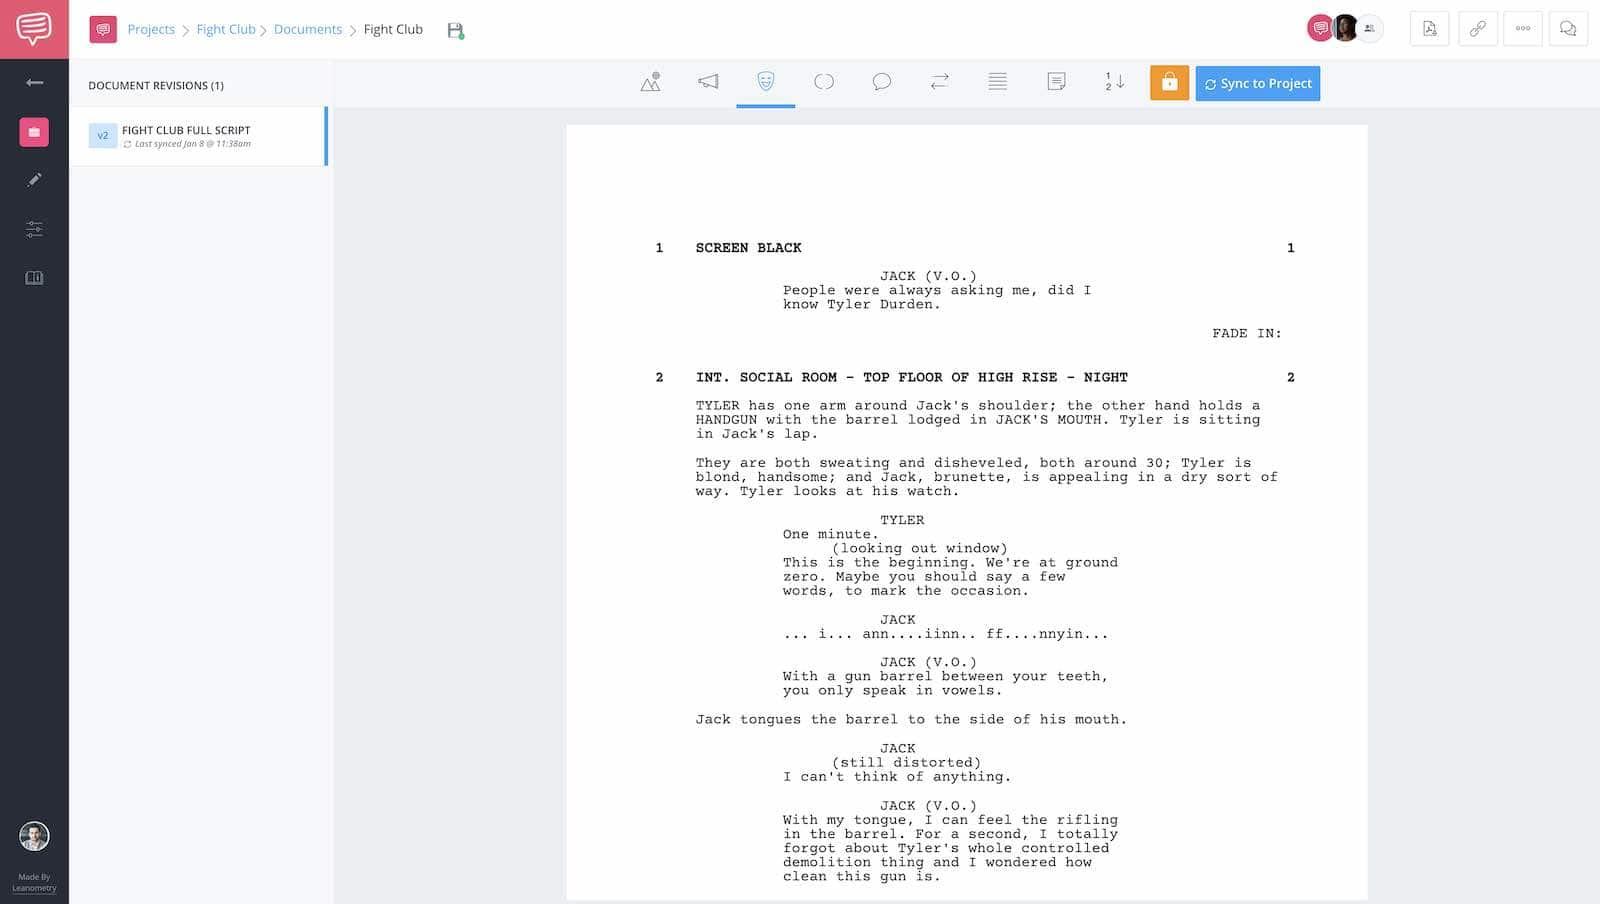 Fight Club Script Breakdown - Full Script - StudioBinder